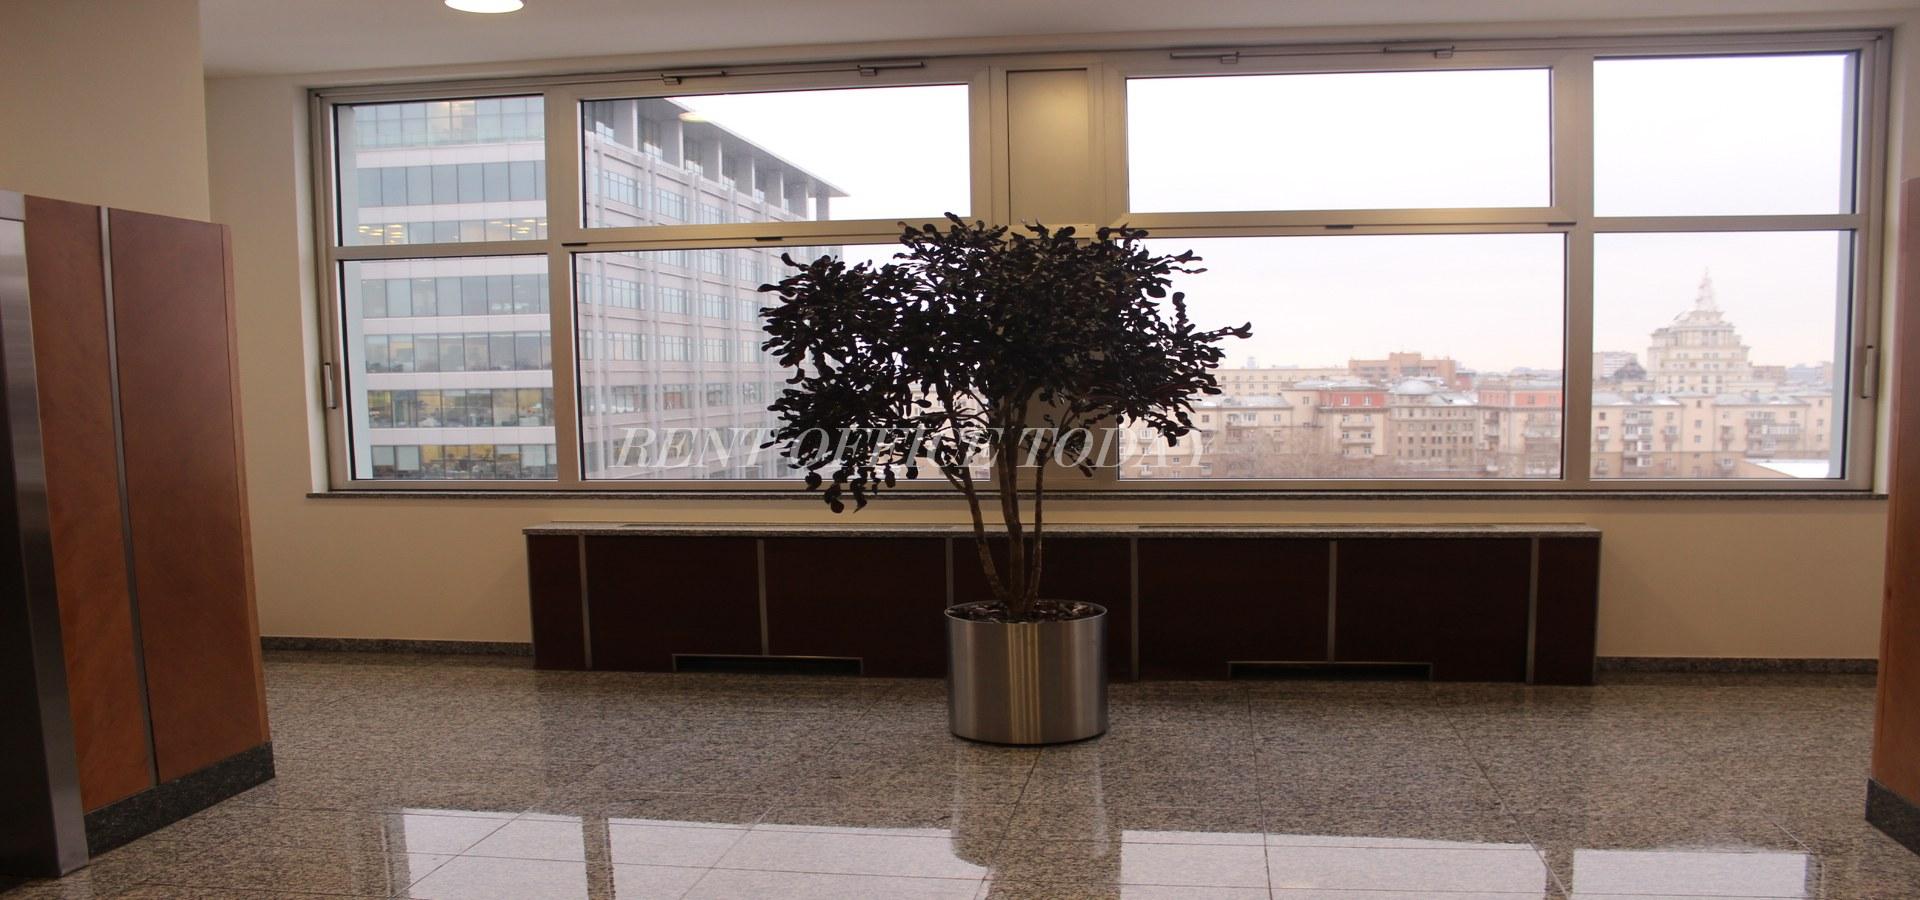 Бизнес центр Дукат плэйс 2